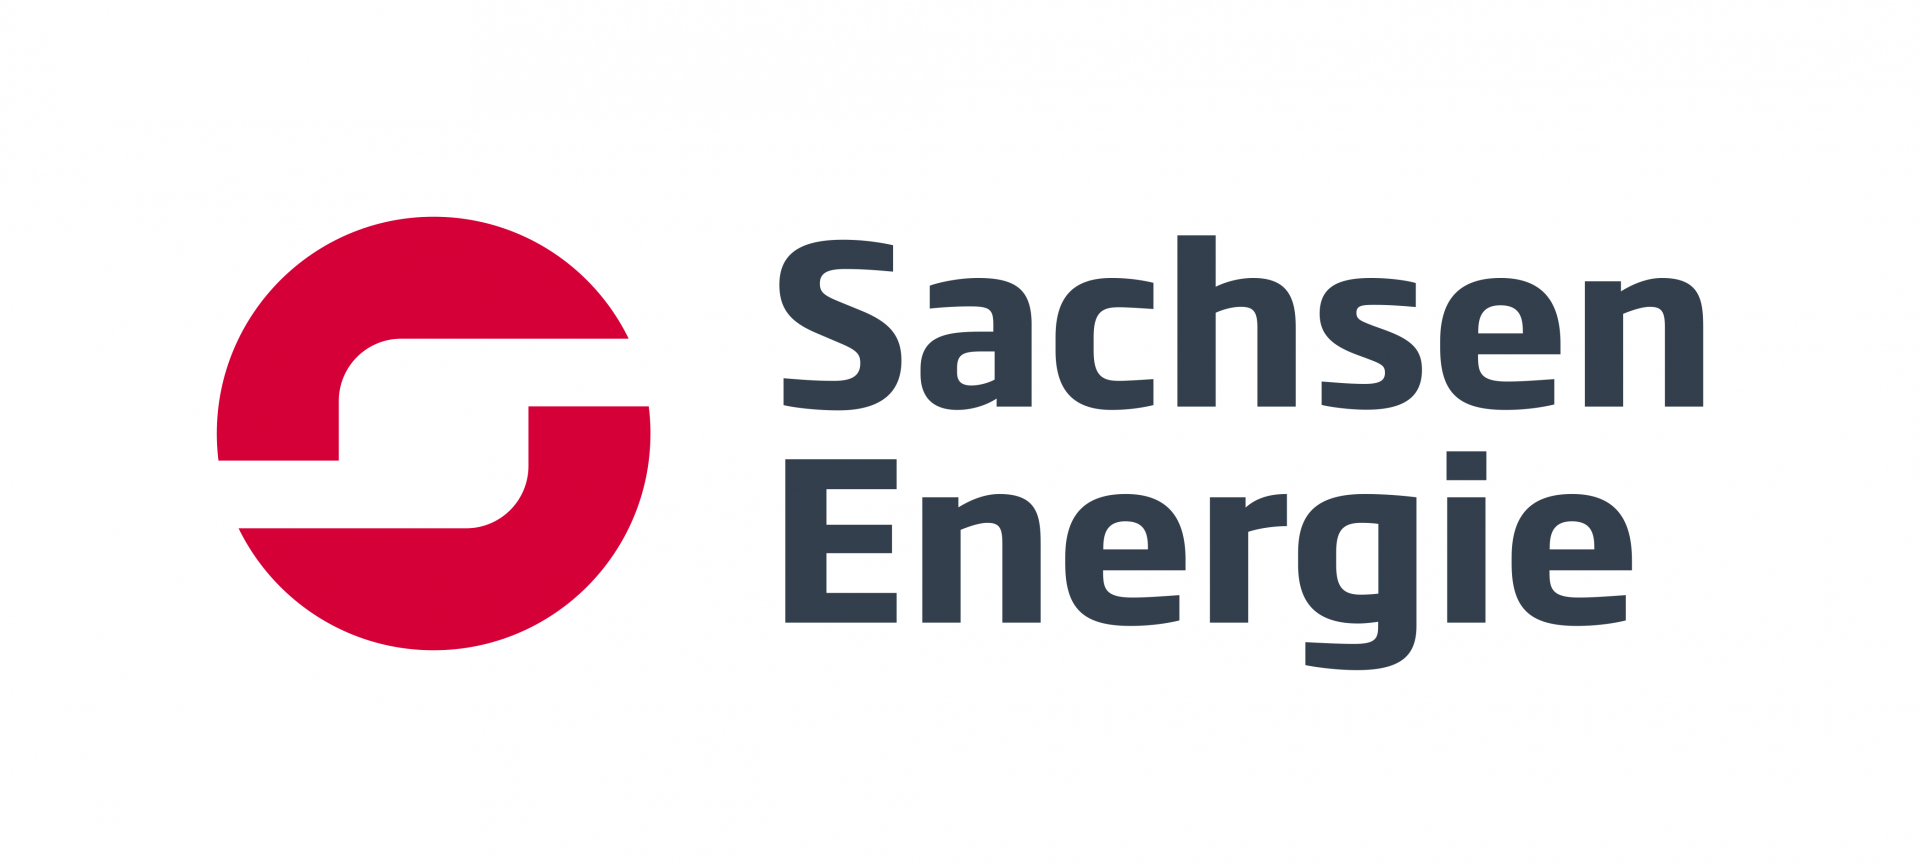 Sachsen Energie